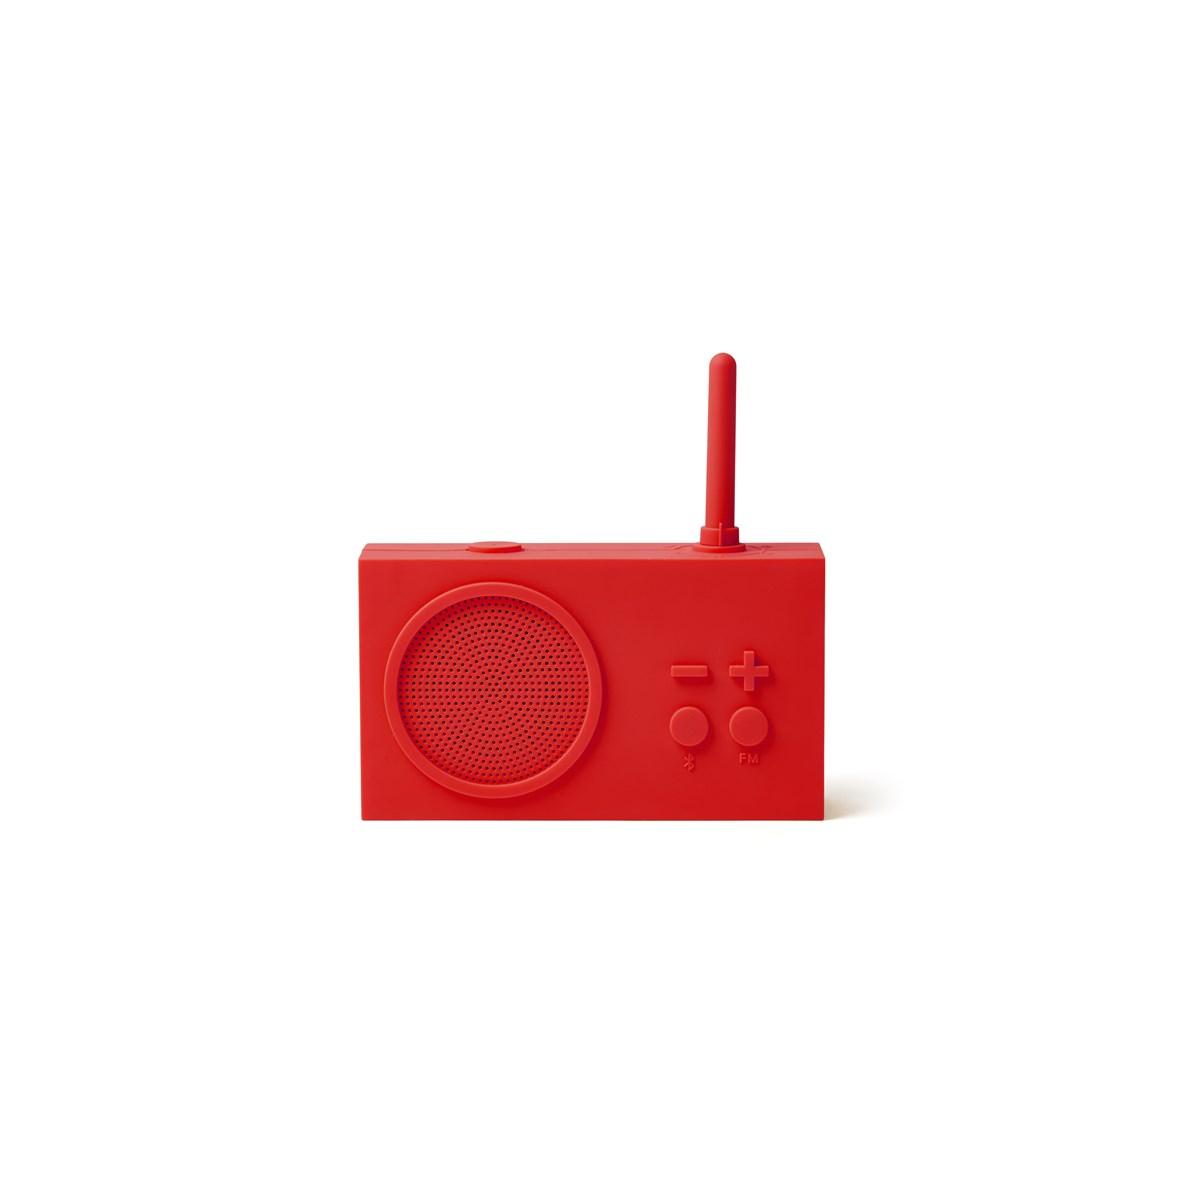 Enceinte Bluetooth et Radio en Gomme Rouge